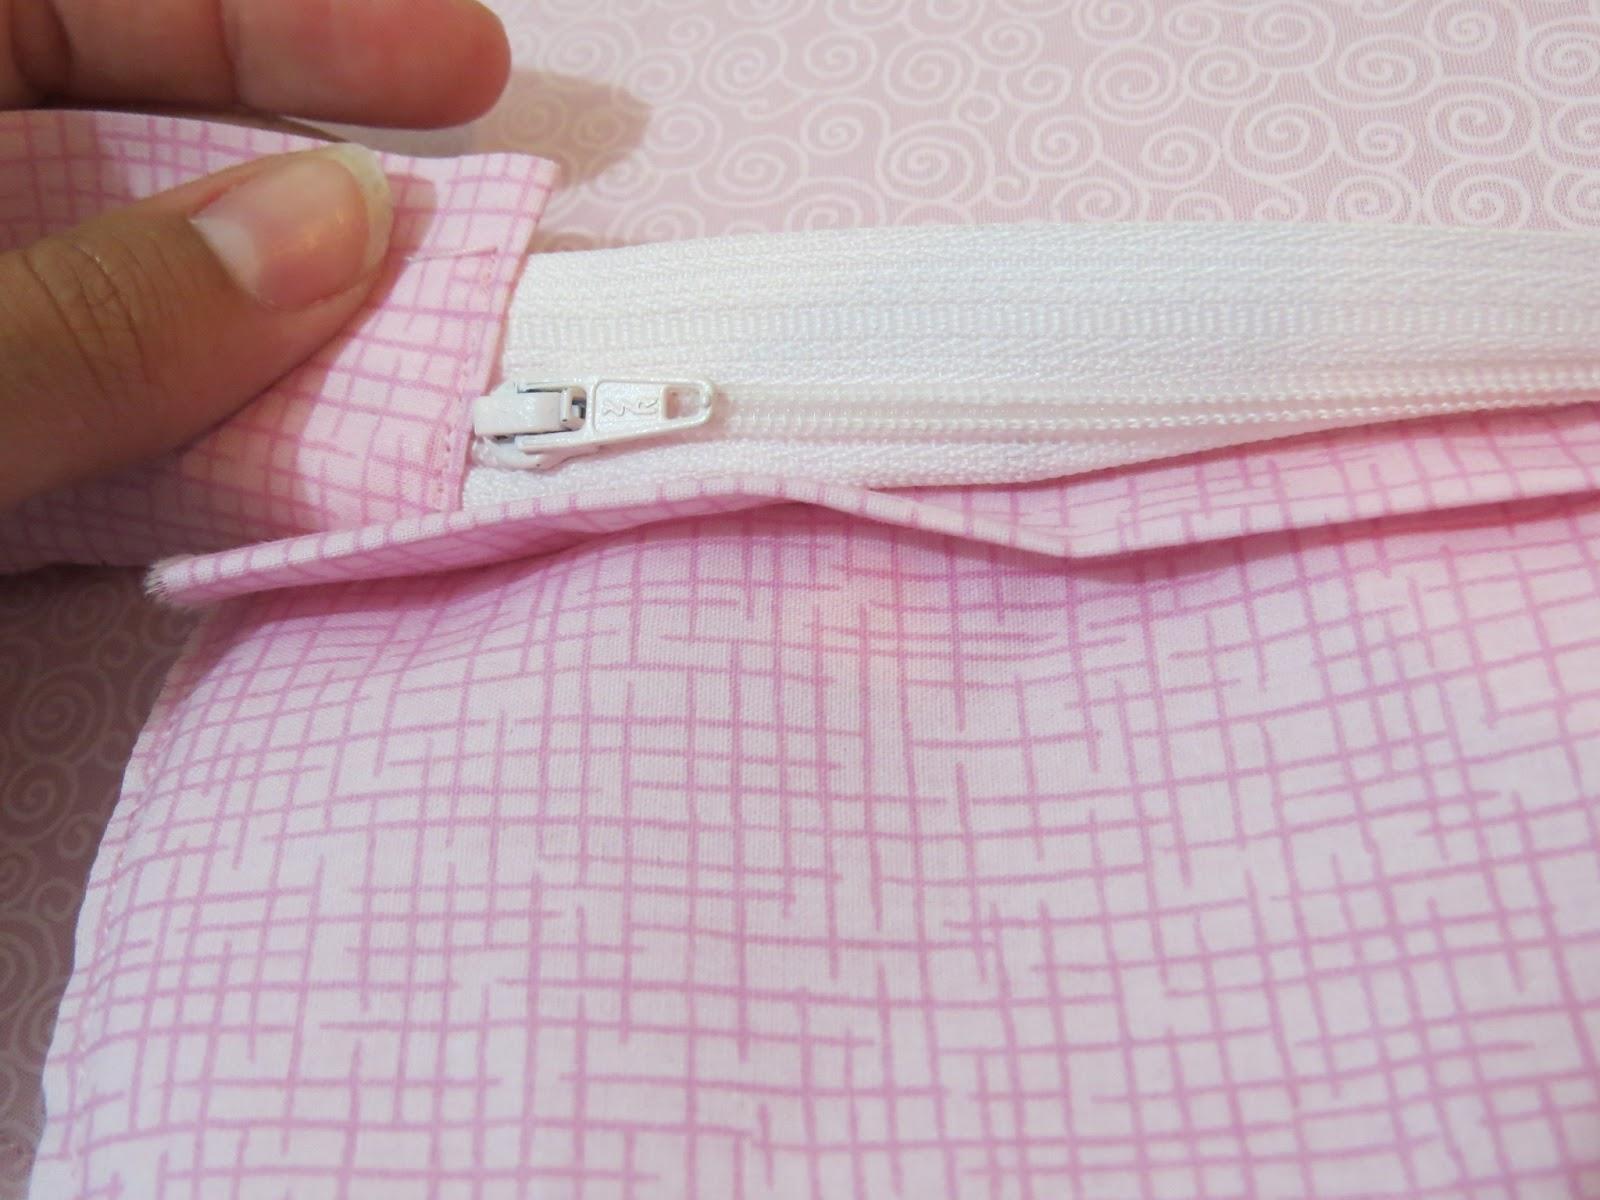 Bolsa De Tecido Tiracolo Passo A Passo : Stella hoff patchwork bolsa tiracolo com al?a regul?vel pap